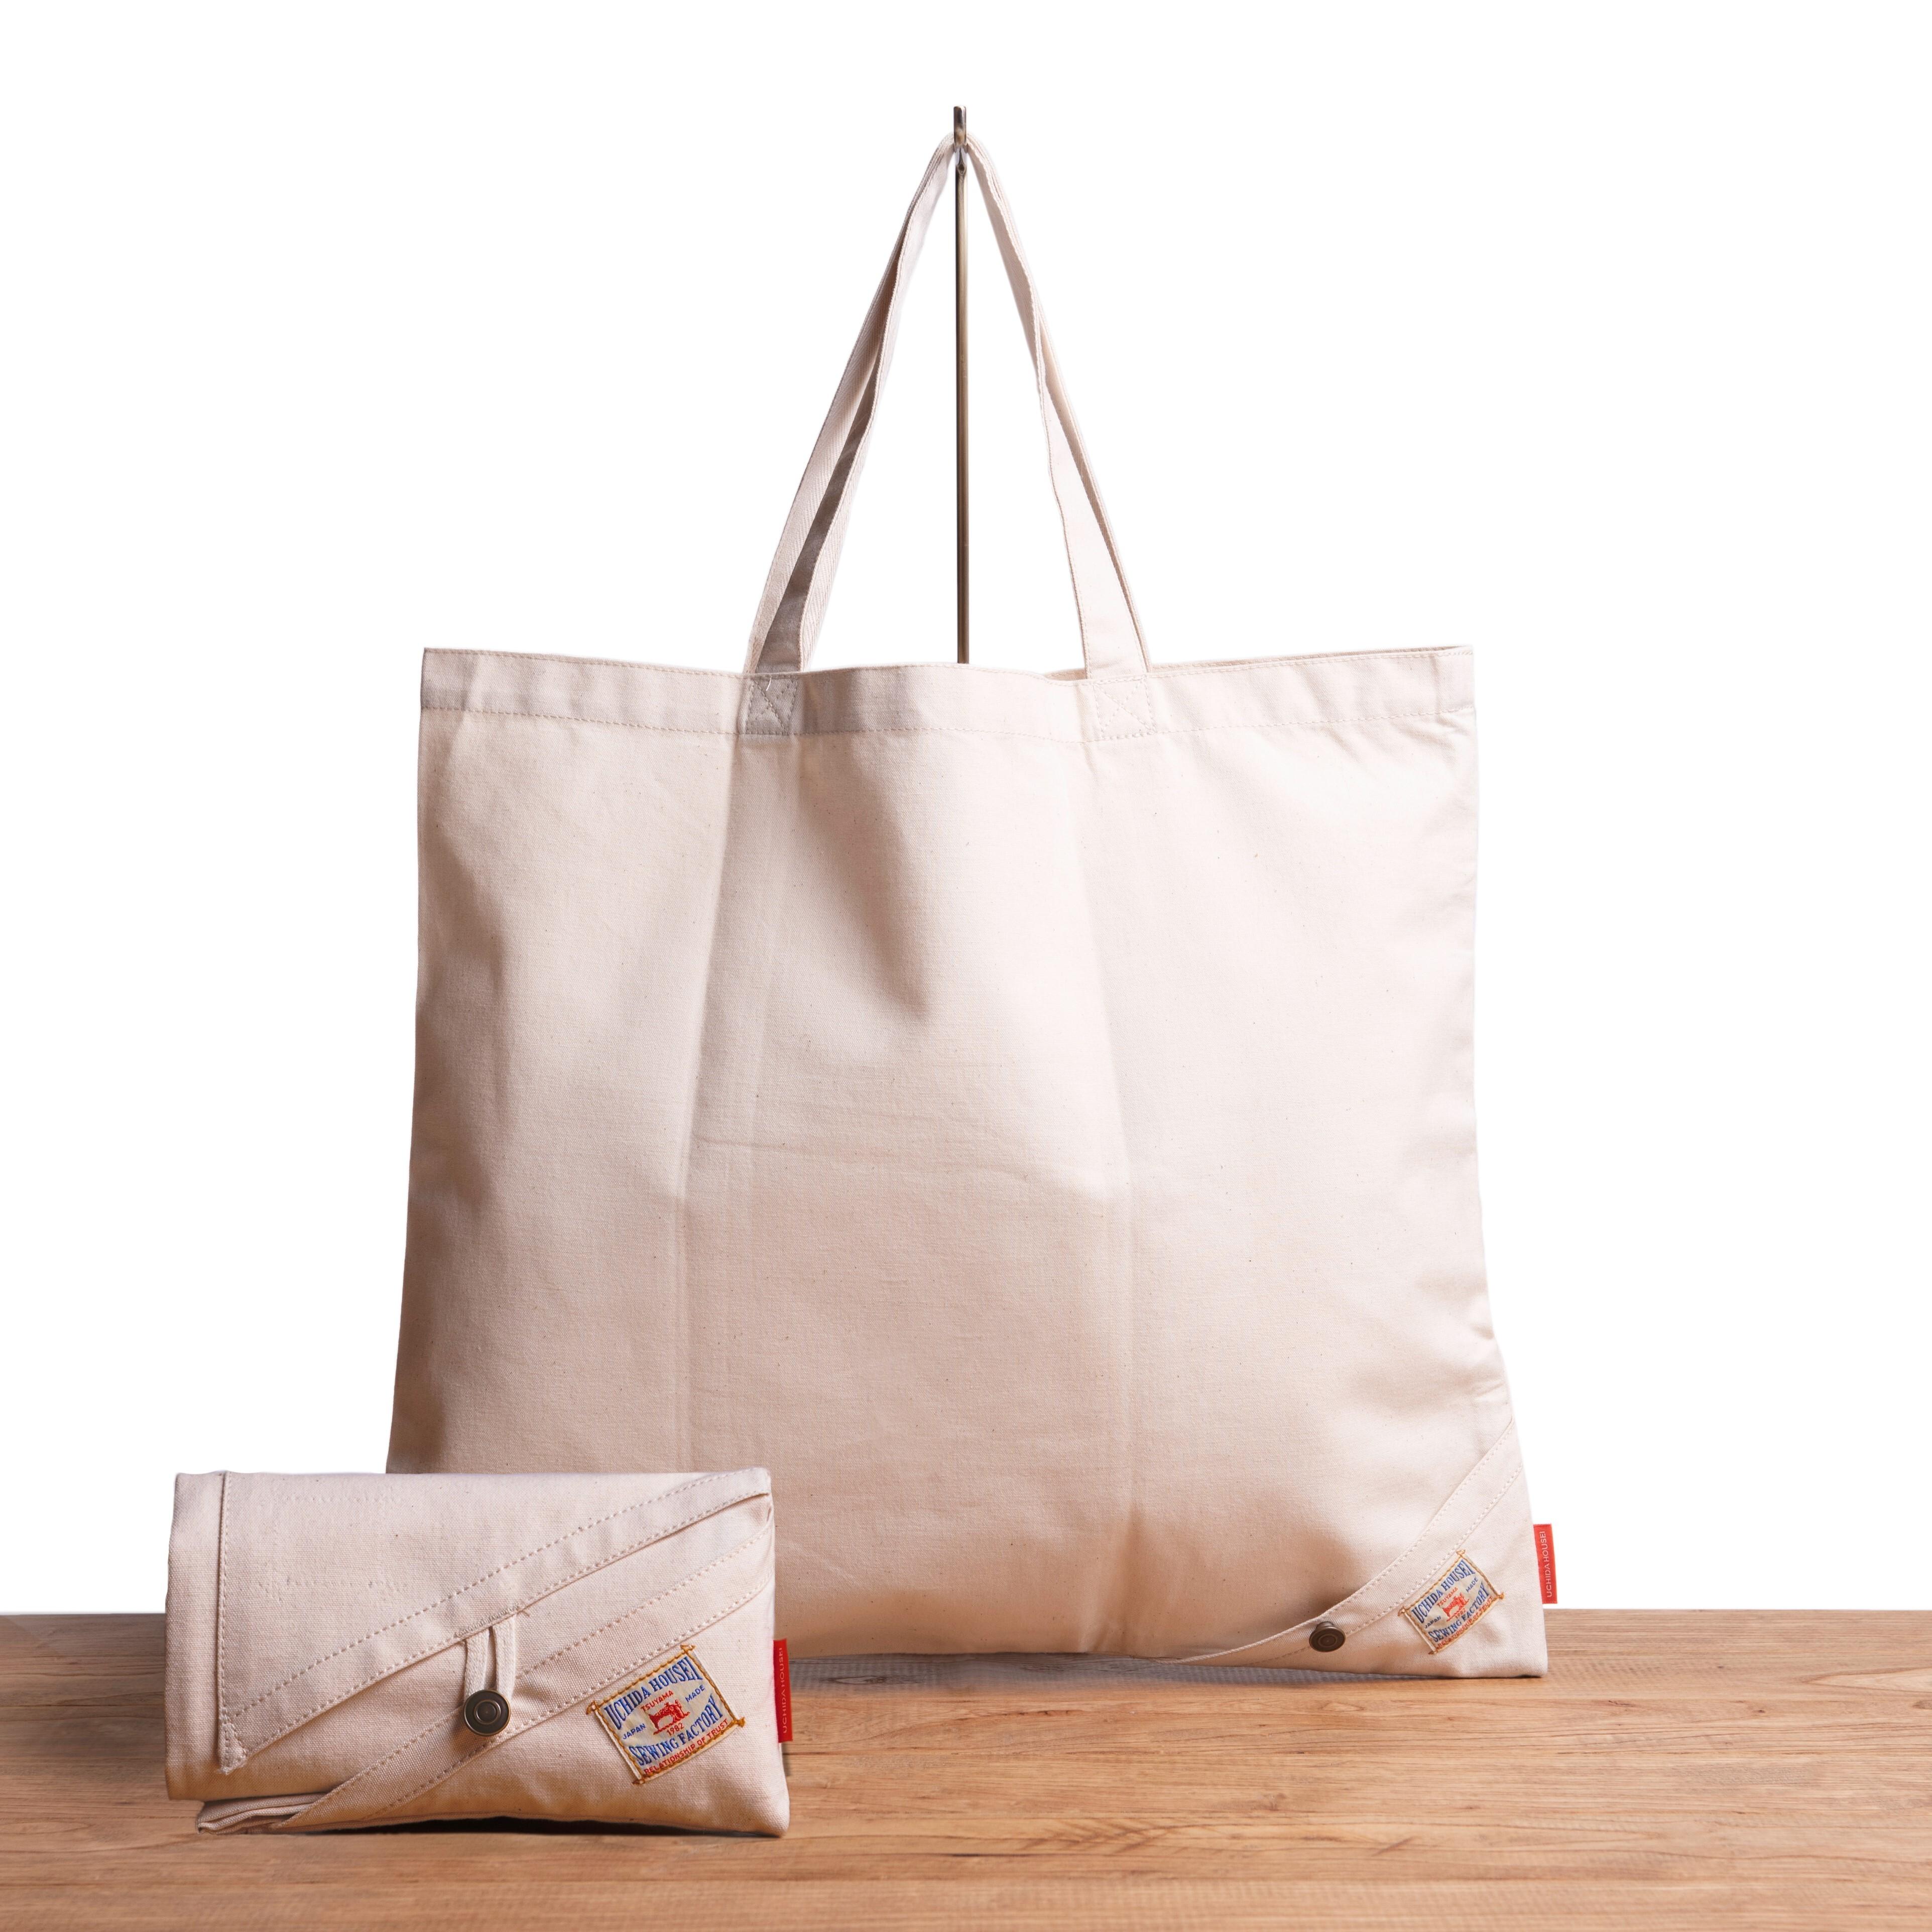 SHOPPING BAG LARGE【ショッピングバッグ ラージ】